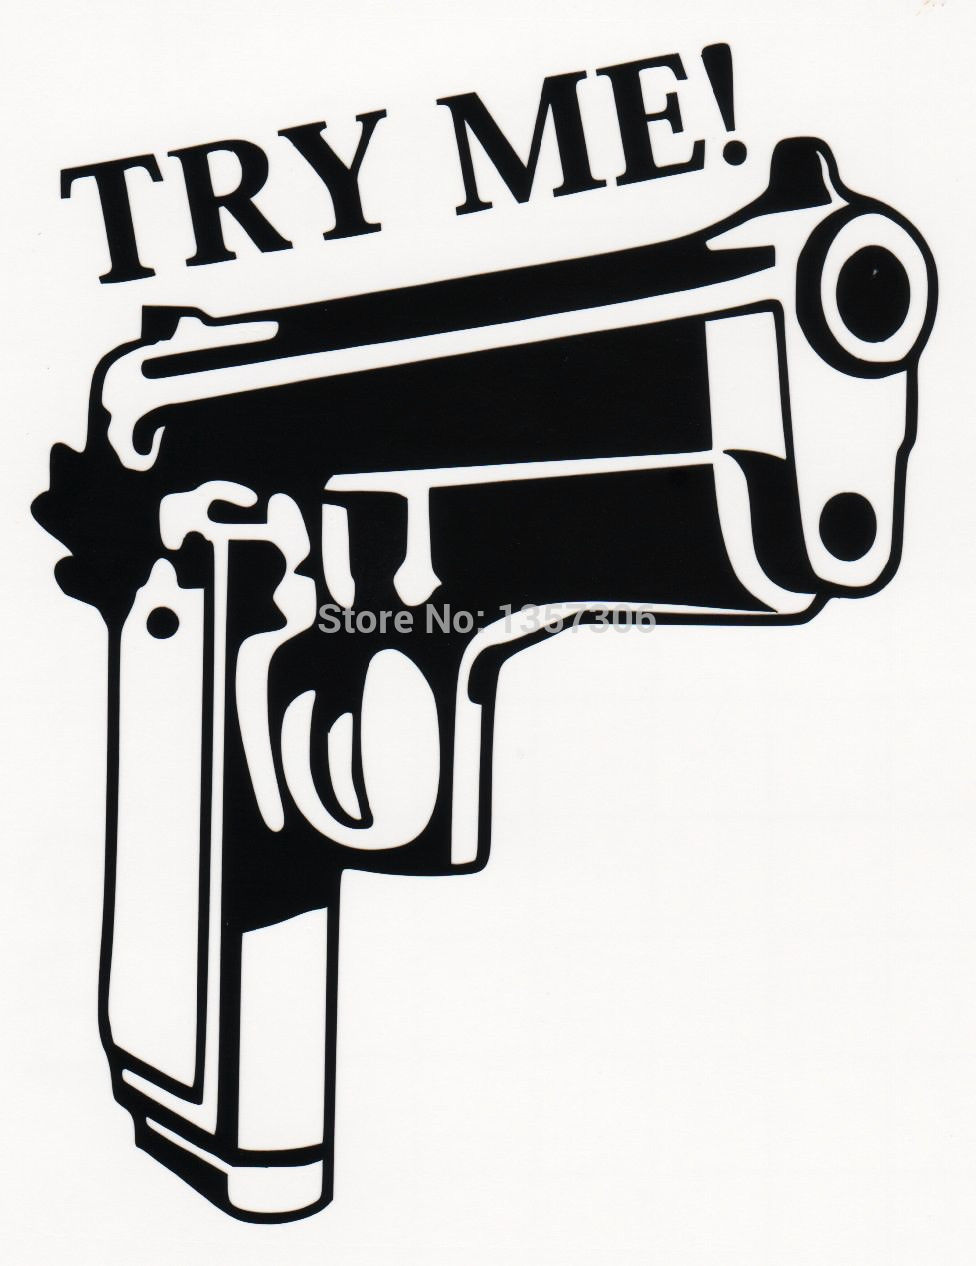 Bumper sticker creator free - Wholesale 40 Pcs Lot Try Me Handgun Guns Vinyl Decal Sticker Car Window Funny Truck